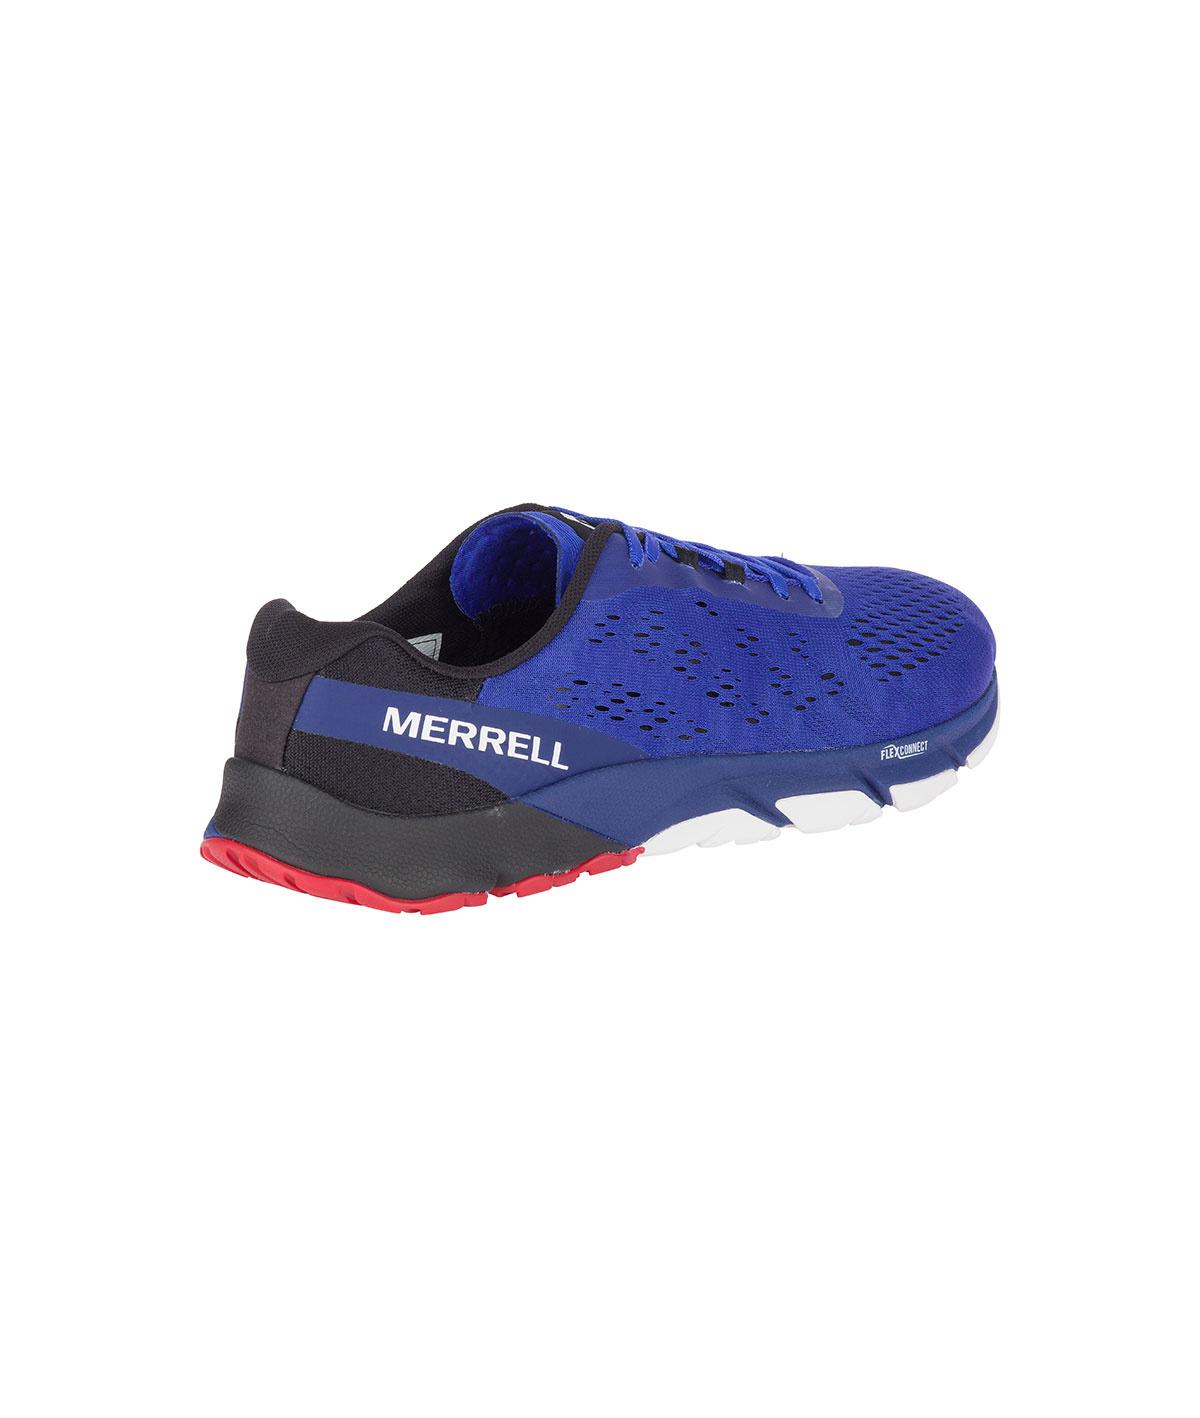 Merrell bare access flex 2  e-mesh j 50469 marine